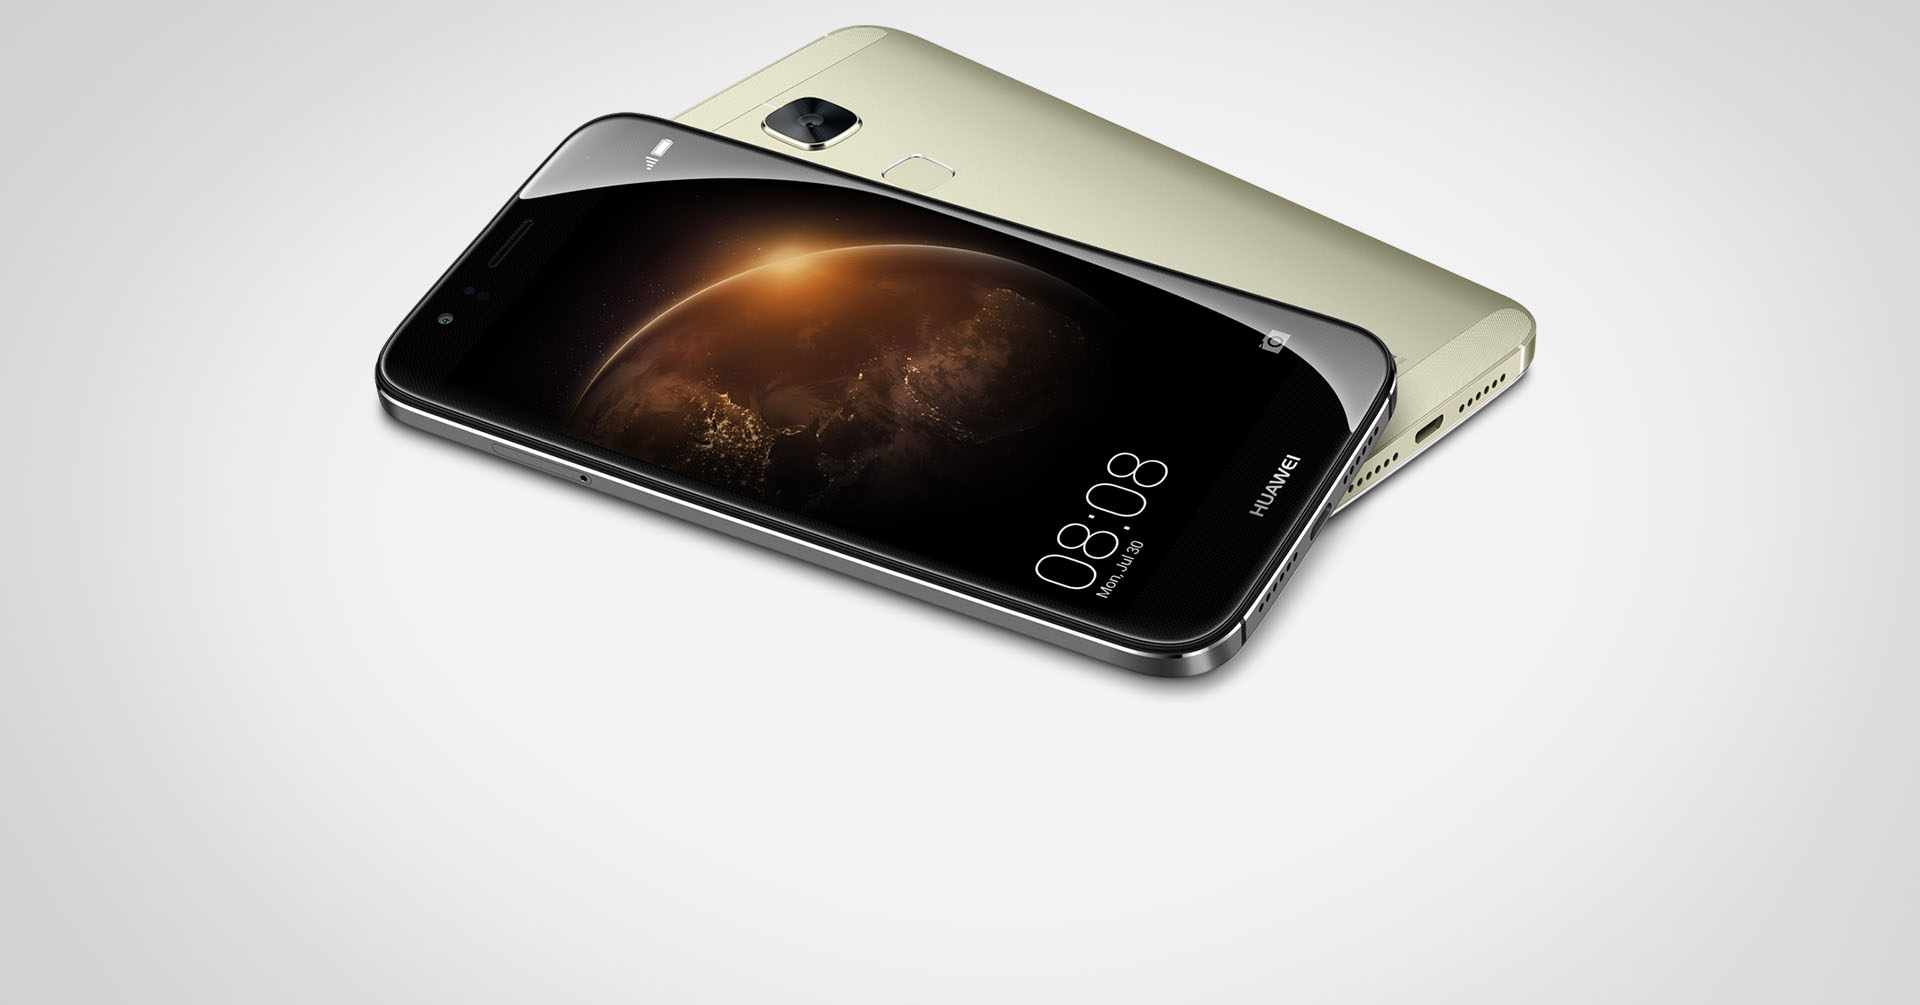 Huawei、5.5インチスマートフォン「Huawei G8」を発表-オクタコア/指紋認証